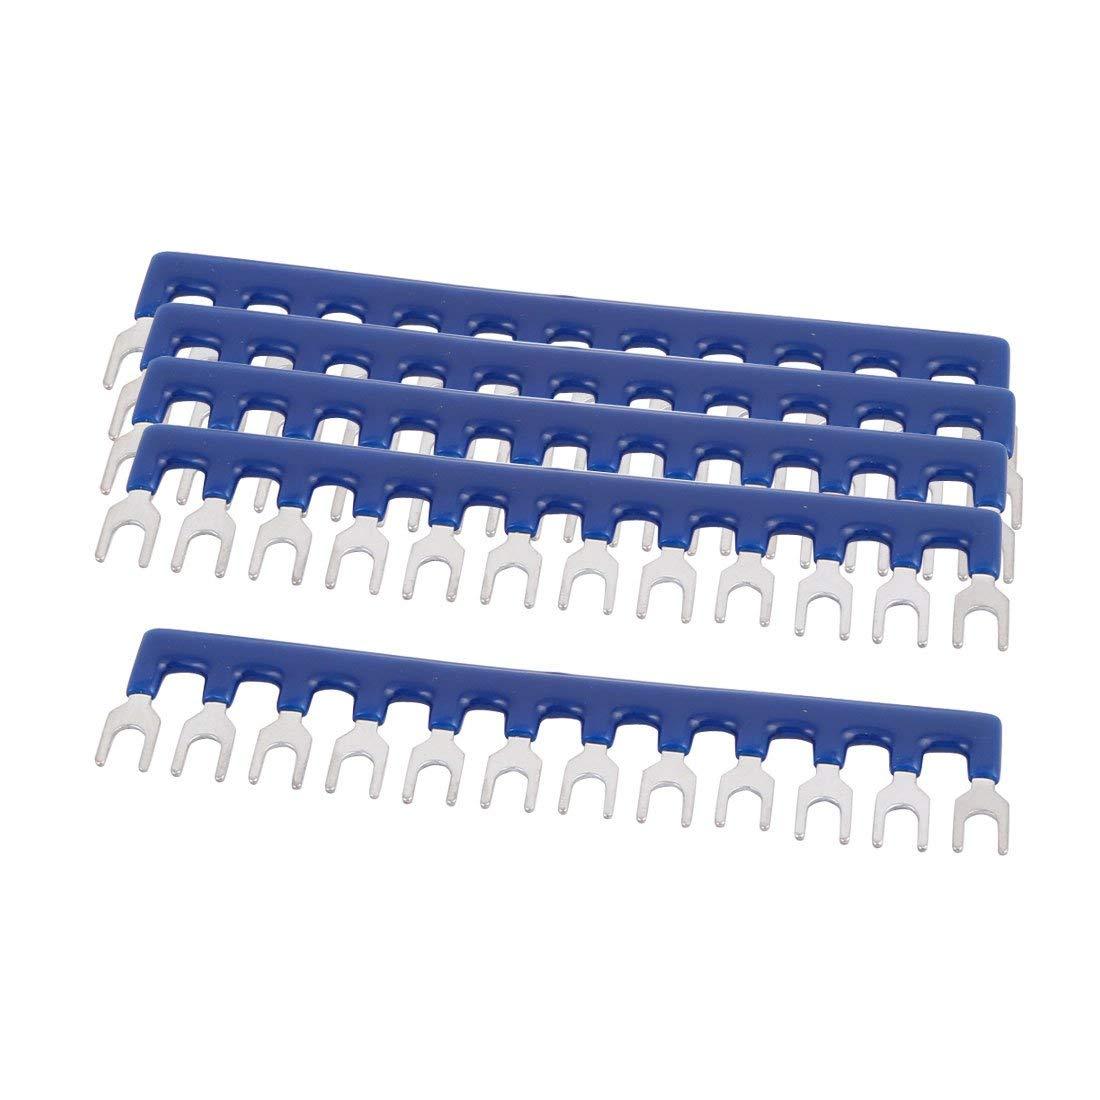 uxcell 5PCS TB-1512 600V 15A 5mm Pitch 12P PCB Terminal Block Strip Barrier Blue